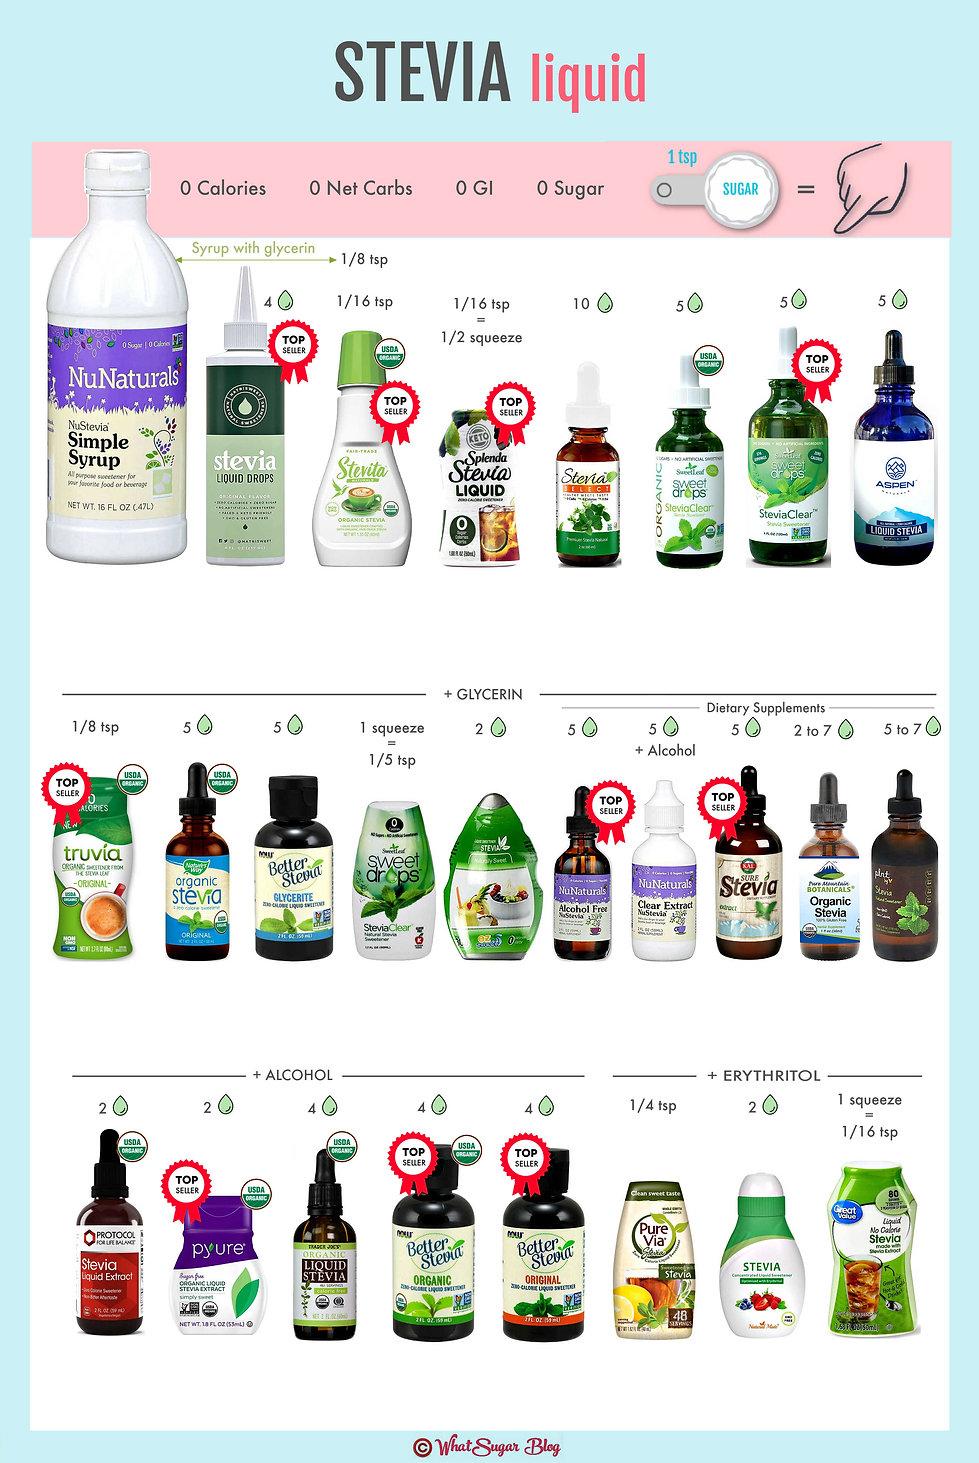 Difference between liquid stevia powder